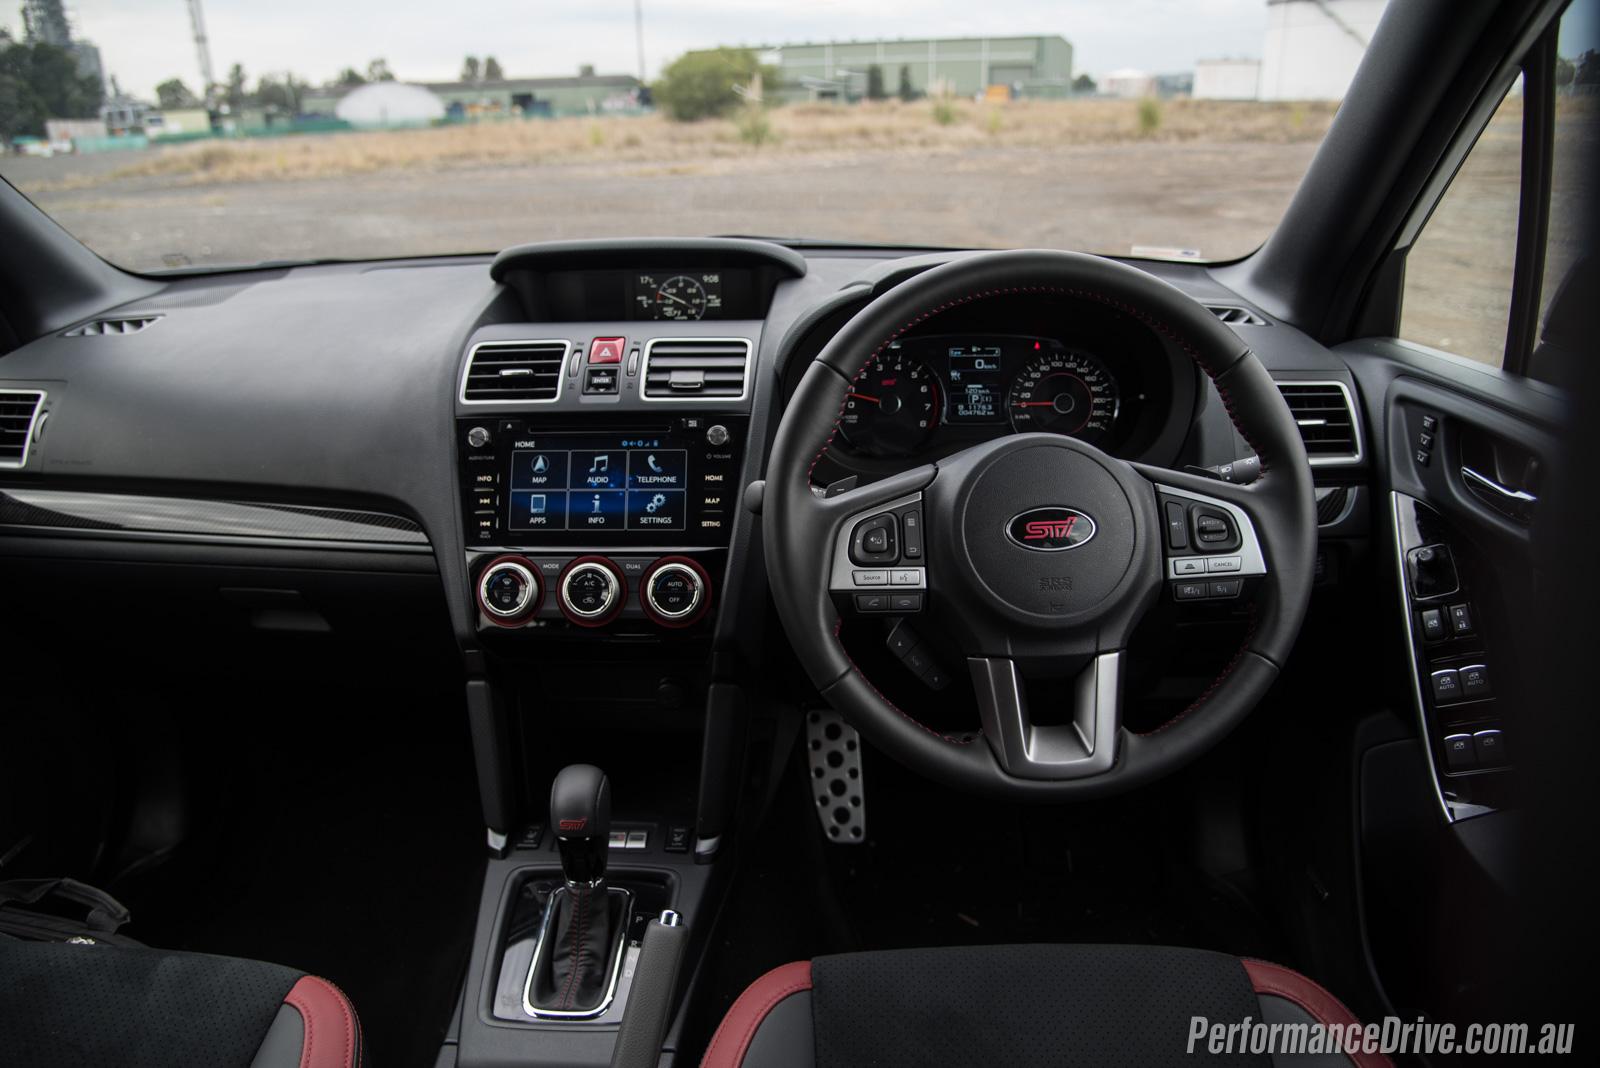 2018 Wrx Sti >> 2016 Subaru Forester tS STI review (video) | PerformanceDrive